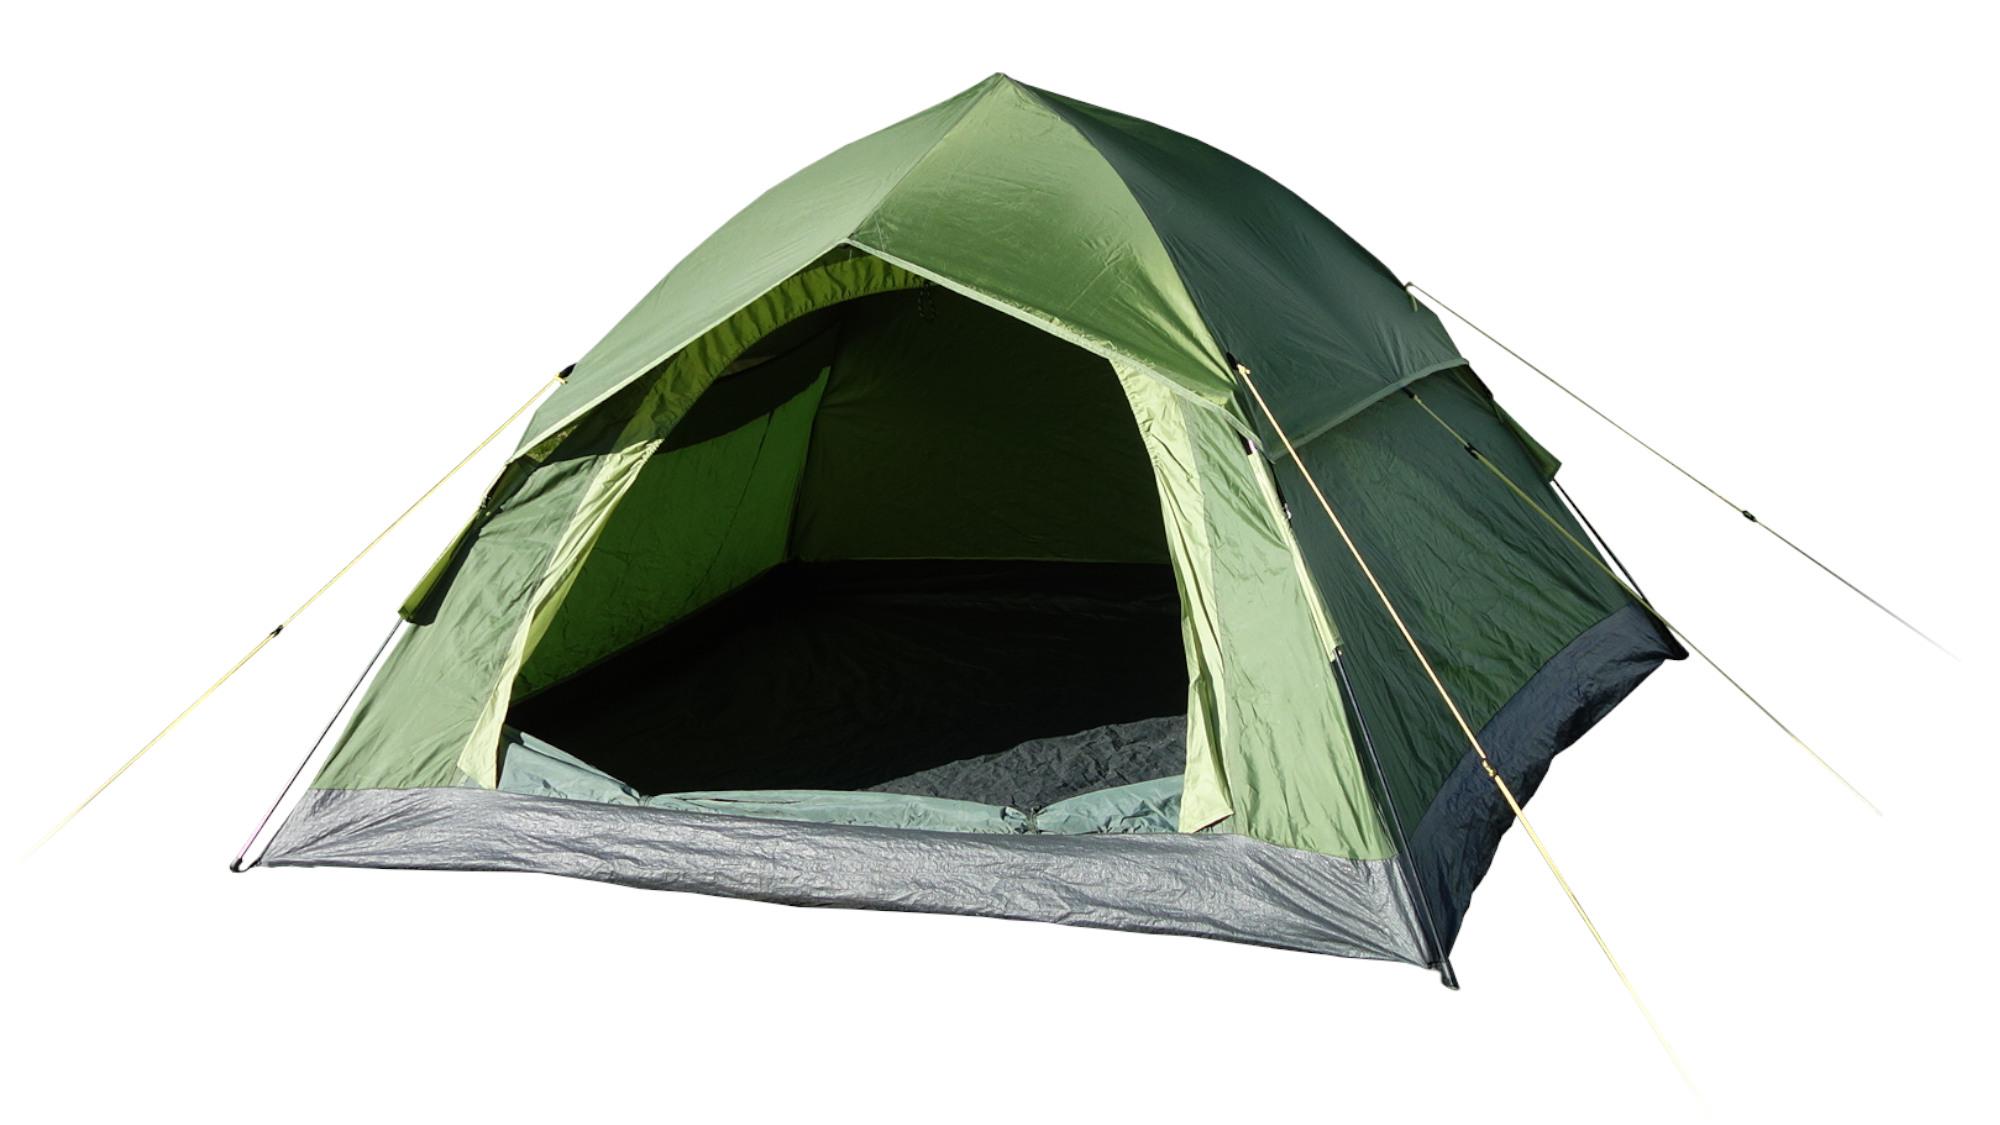 3 Personen Zelt leihen